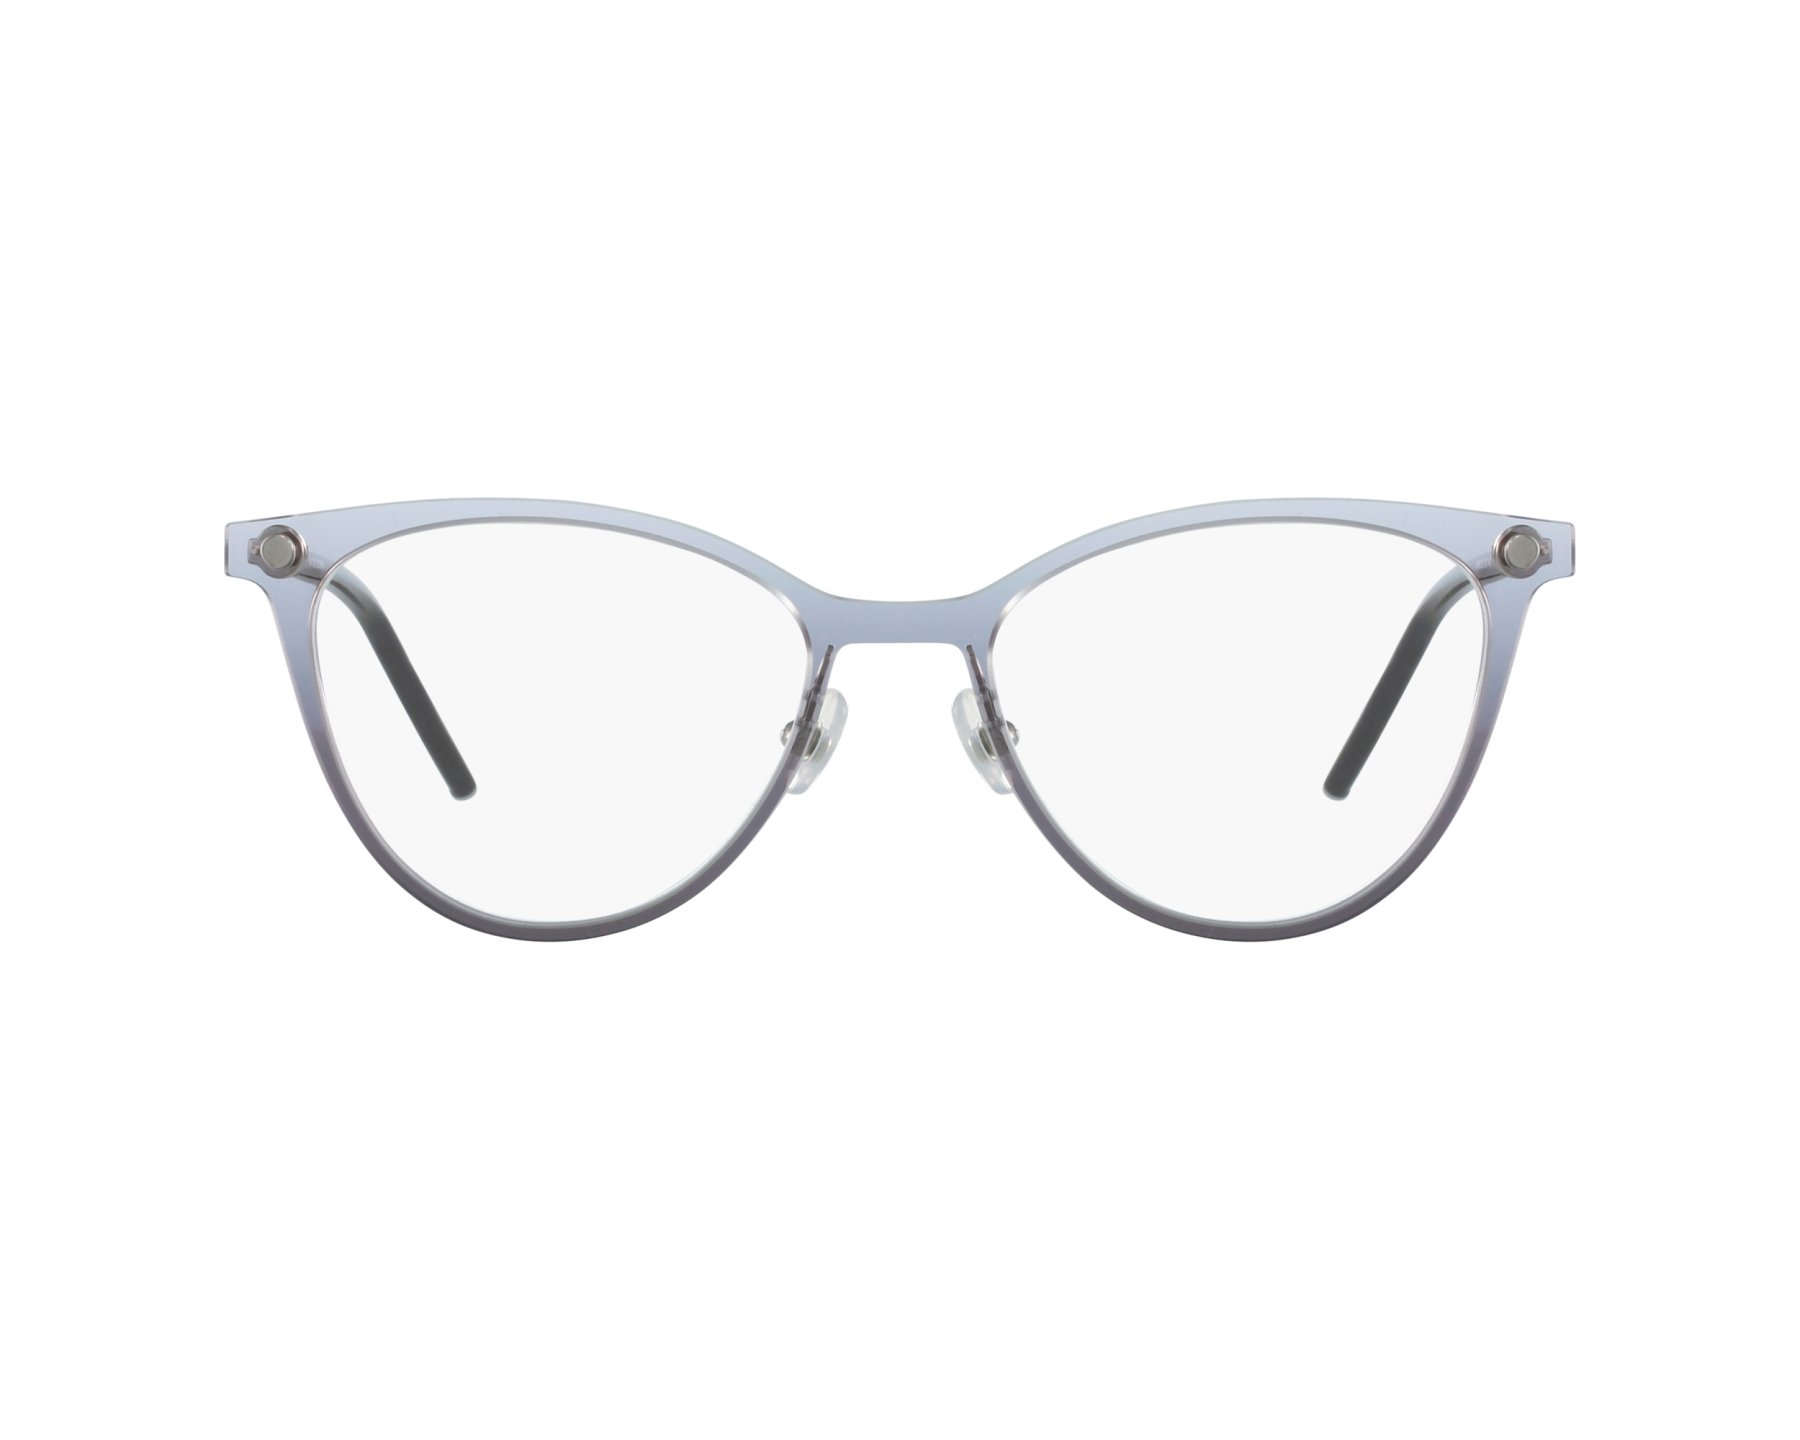 fce1cbb56f3 eyeglasses Marc Jacobs MARC-32 732 - Grey Black profile view